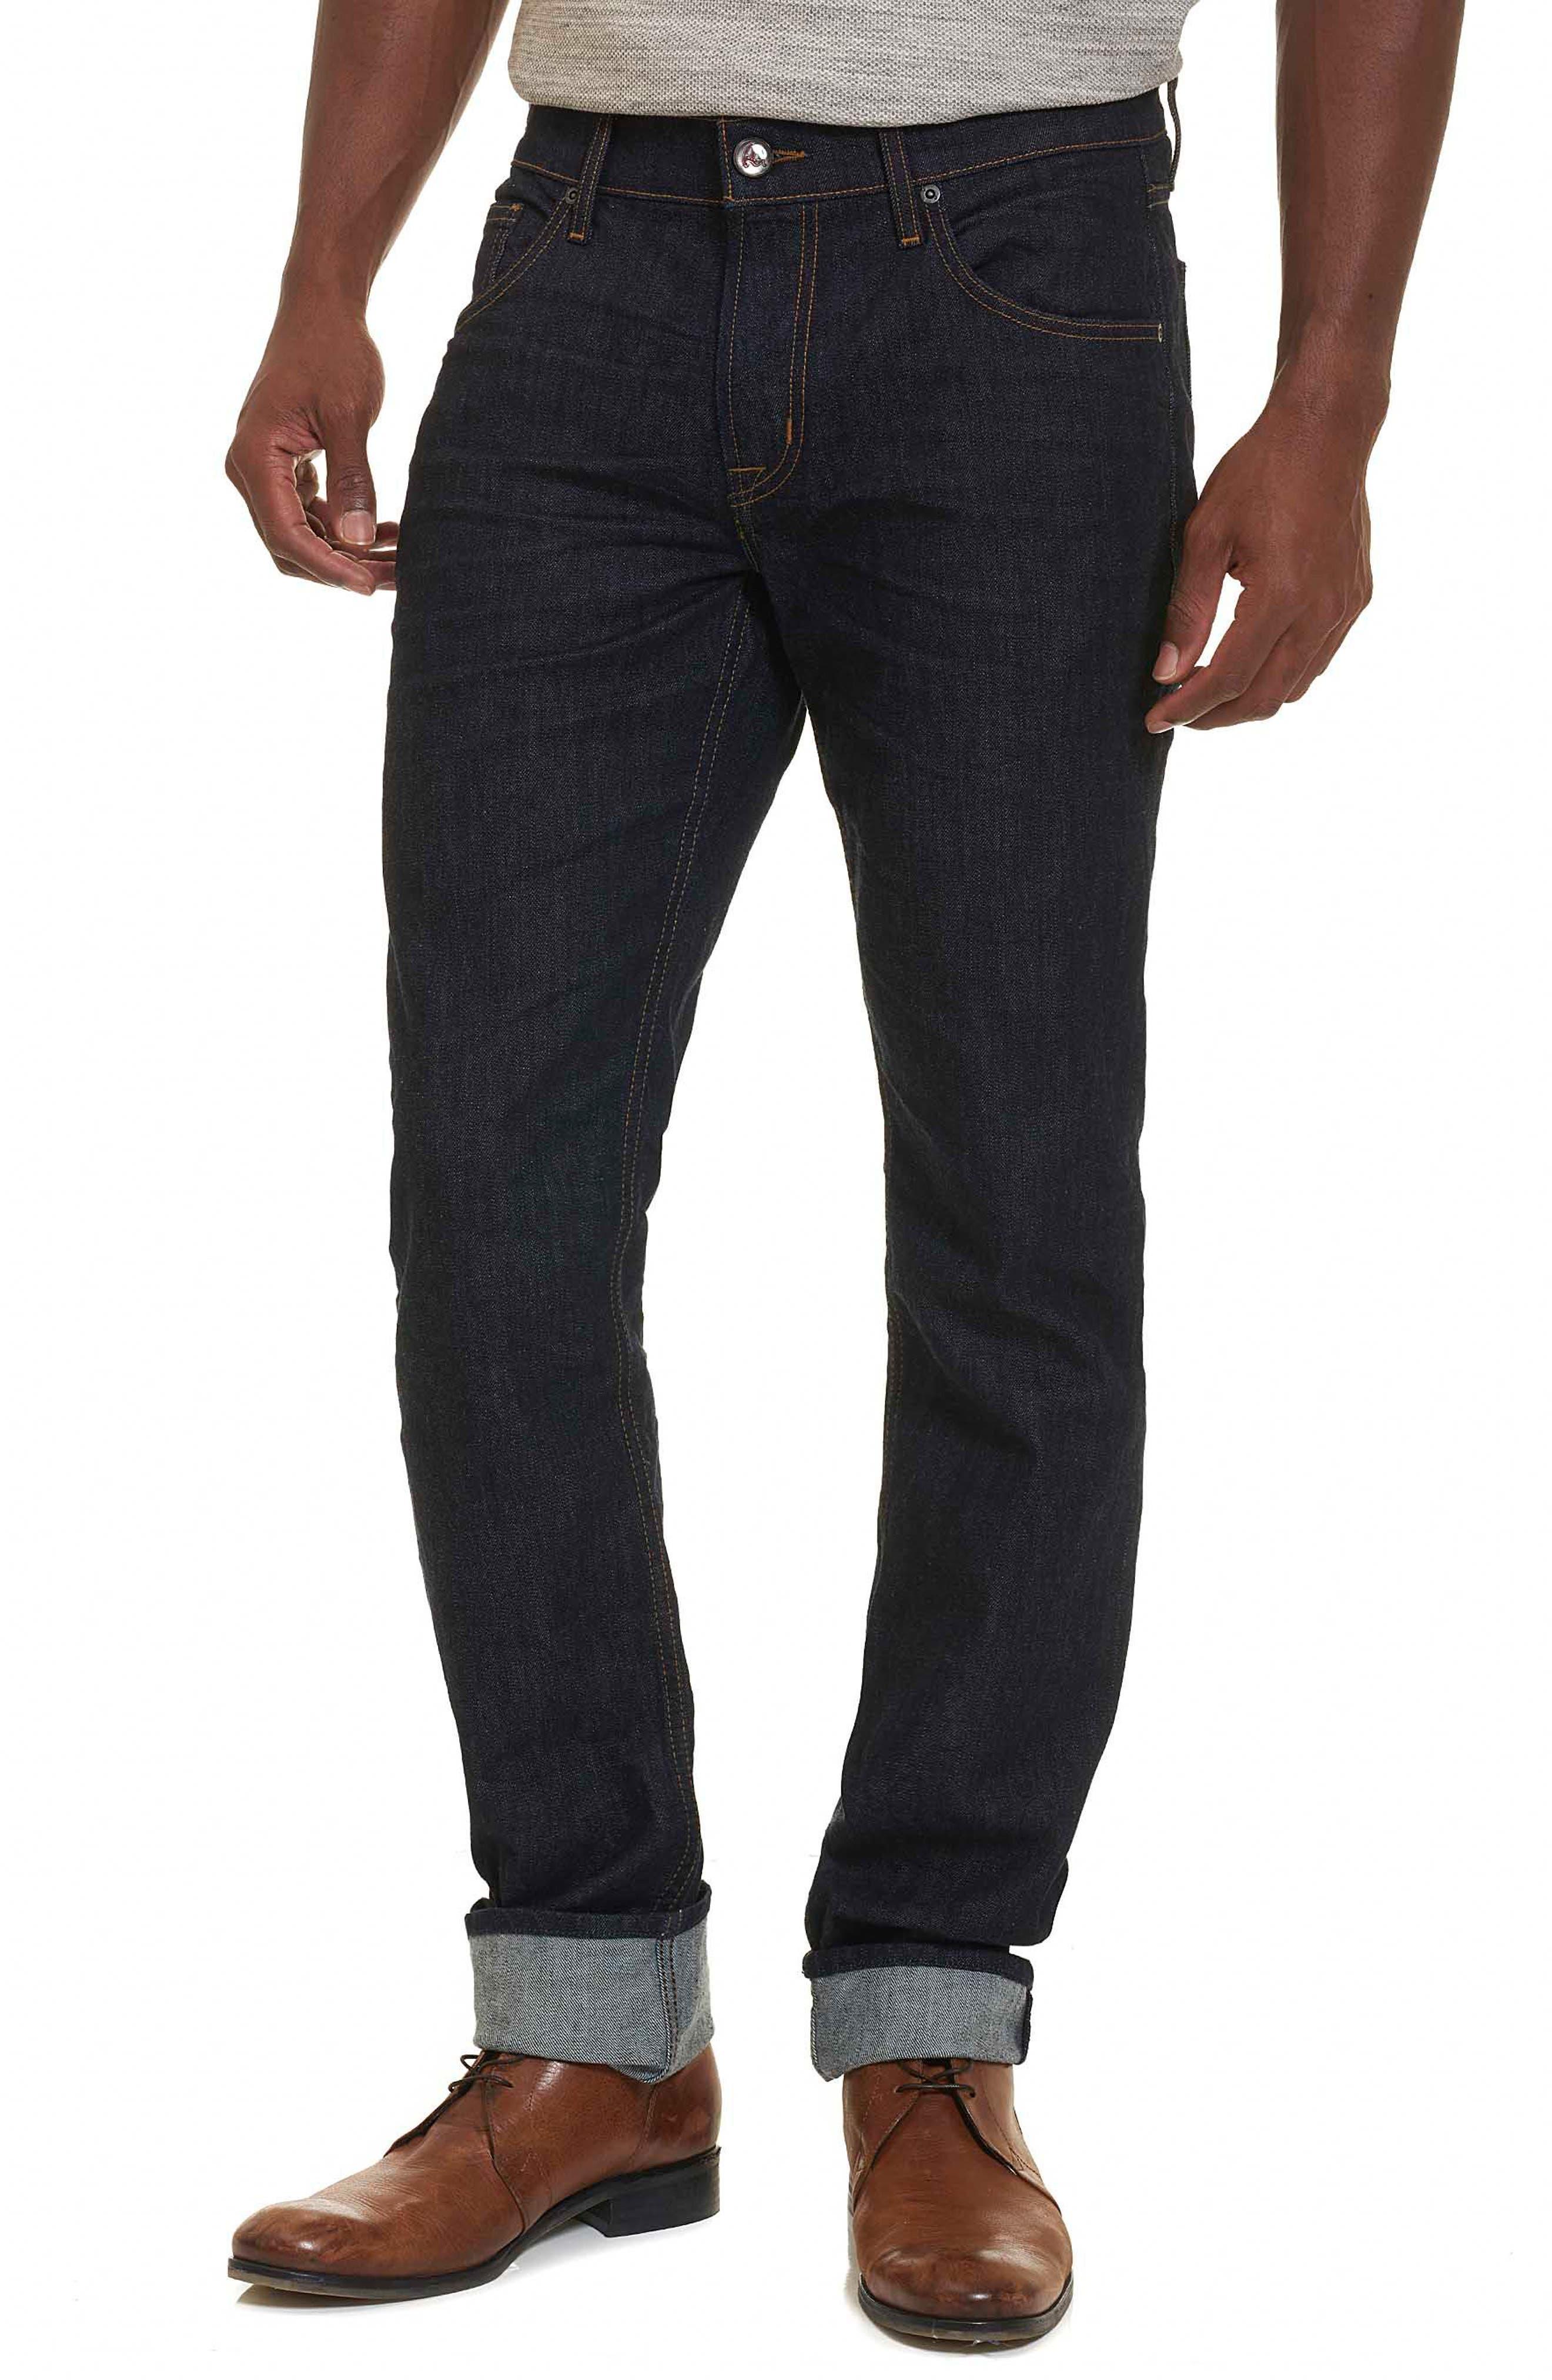 Robert Graham Resist Tailored Fit Jeans (Indigo)